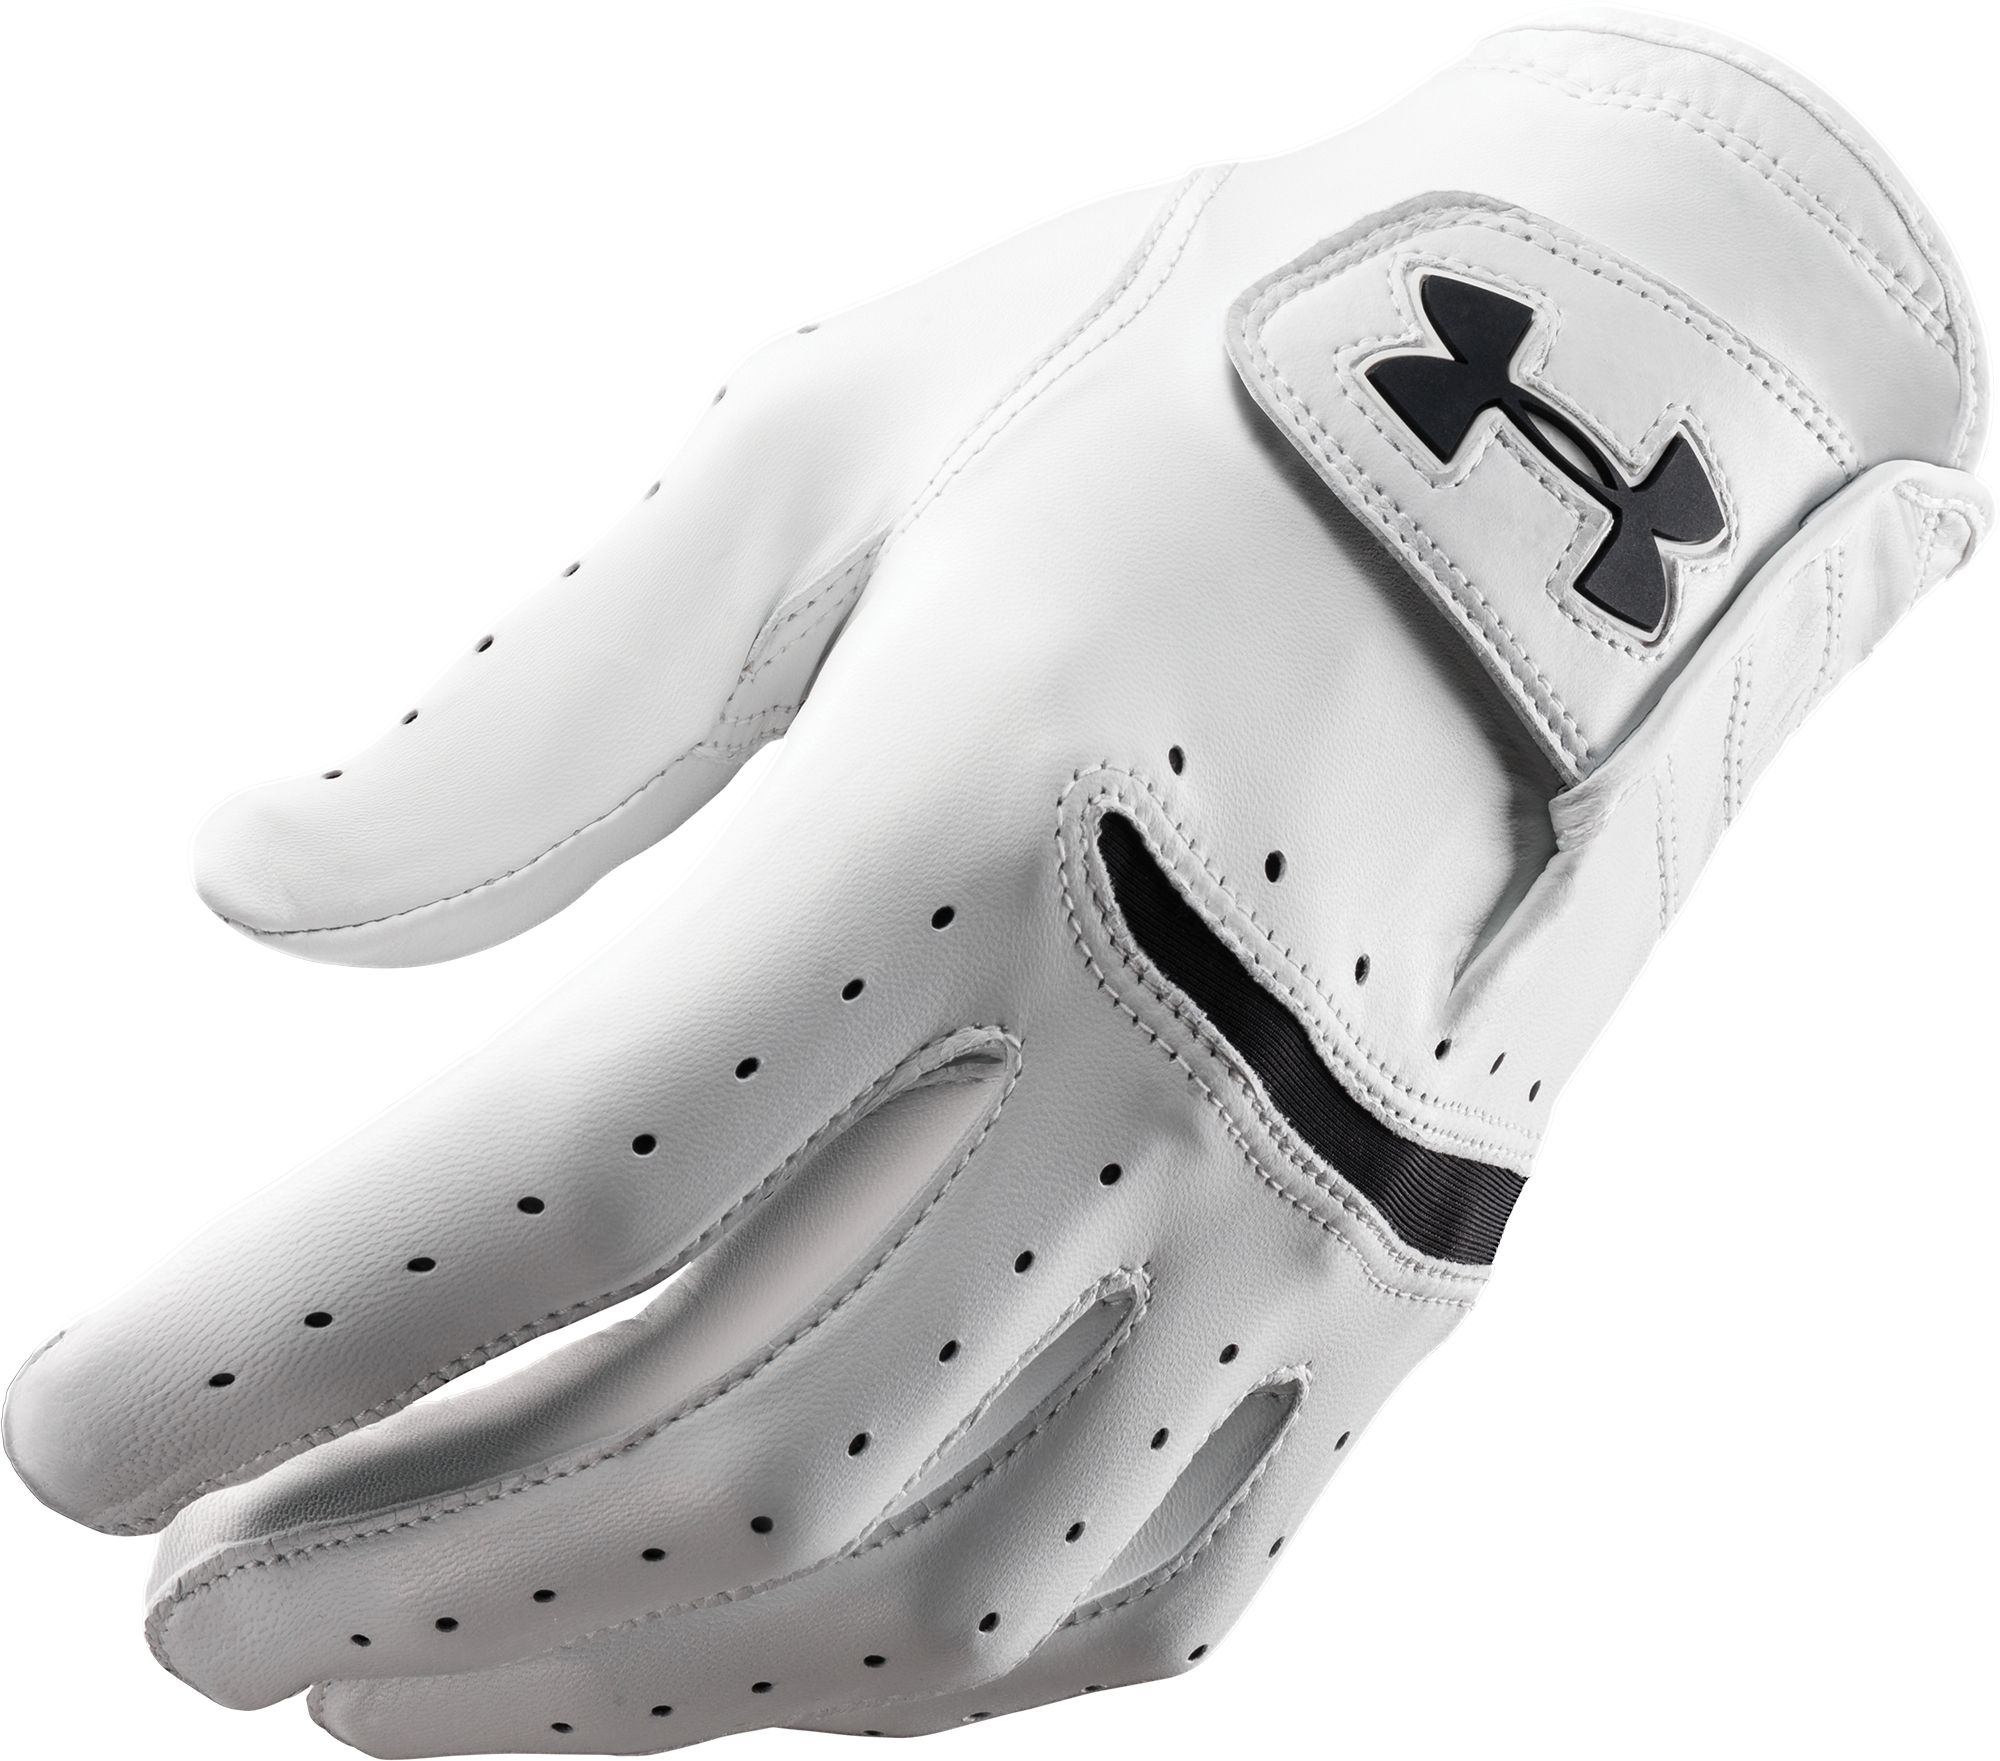 Black leather golf gloves - Product Image Under Armour Strikeskin Tour Golf Glove